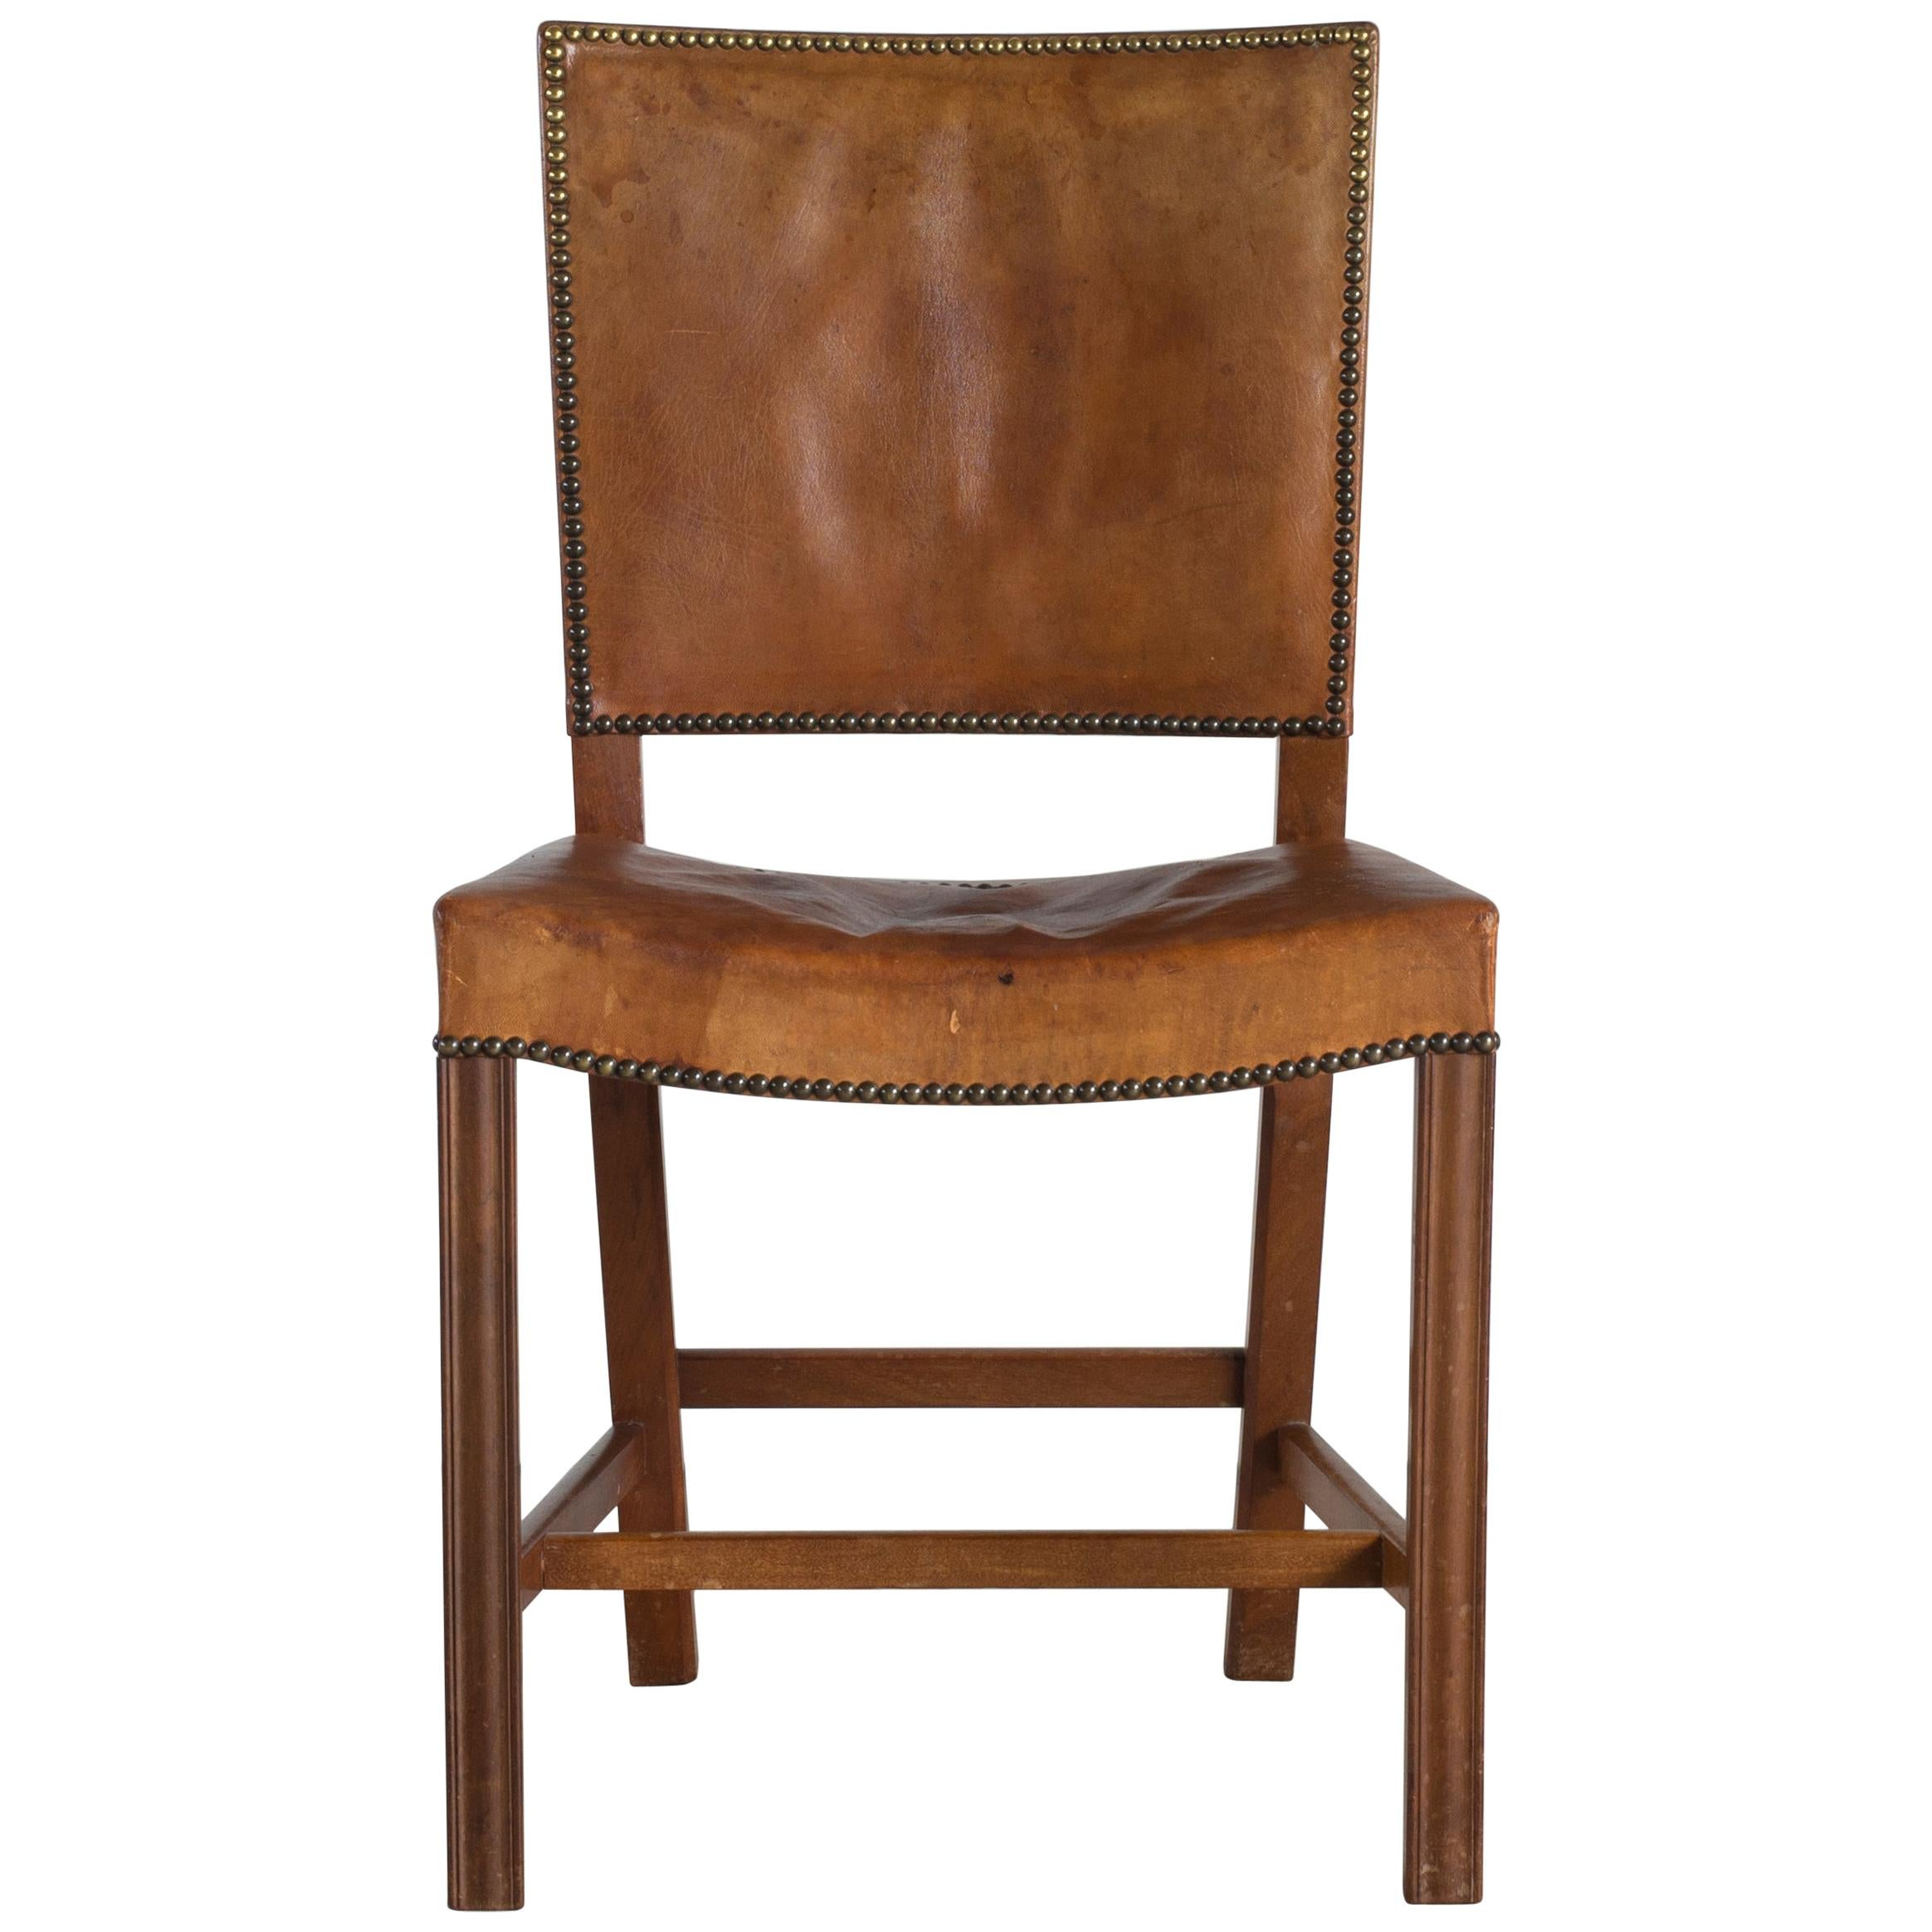 Kaare Klint Red Chair for Rud. Rasmussen